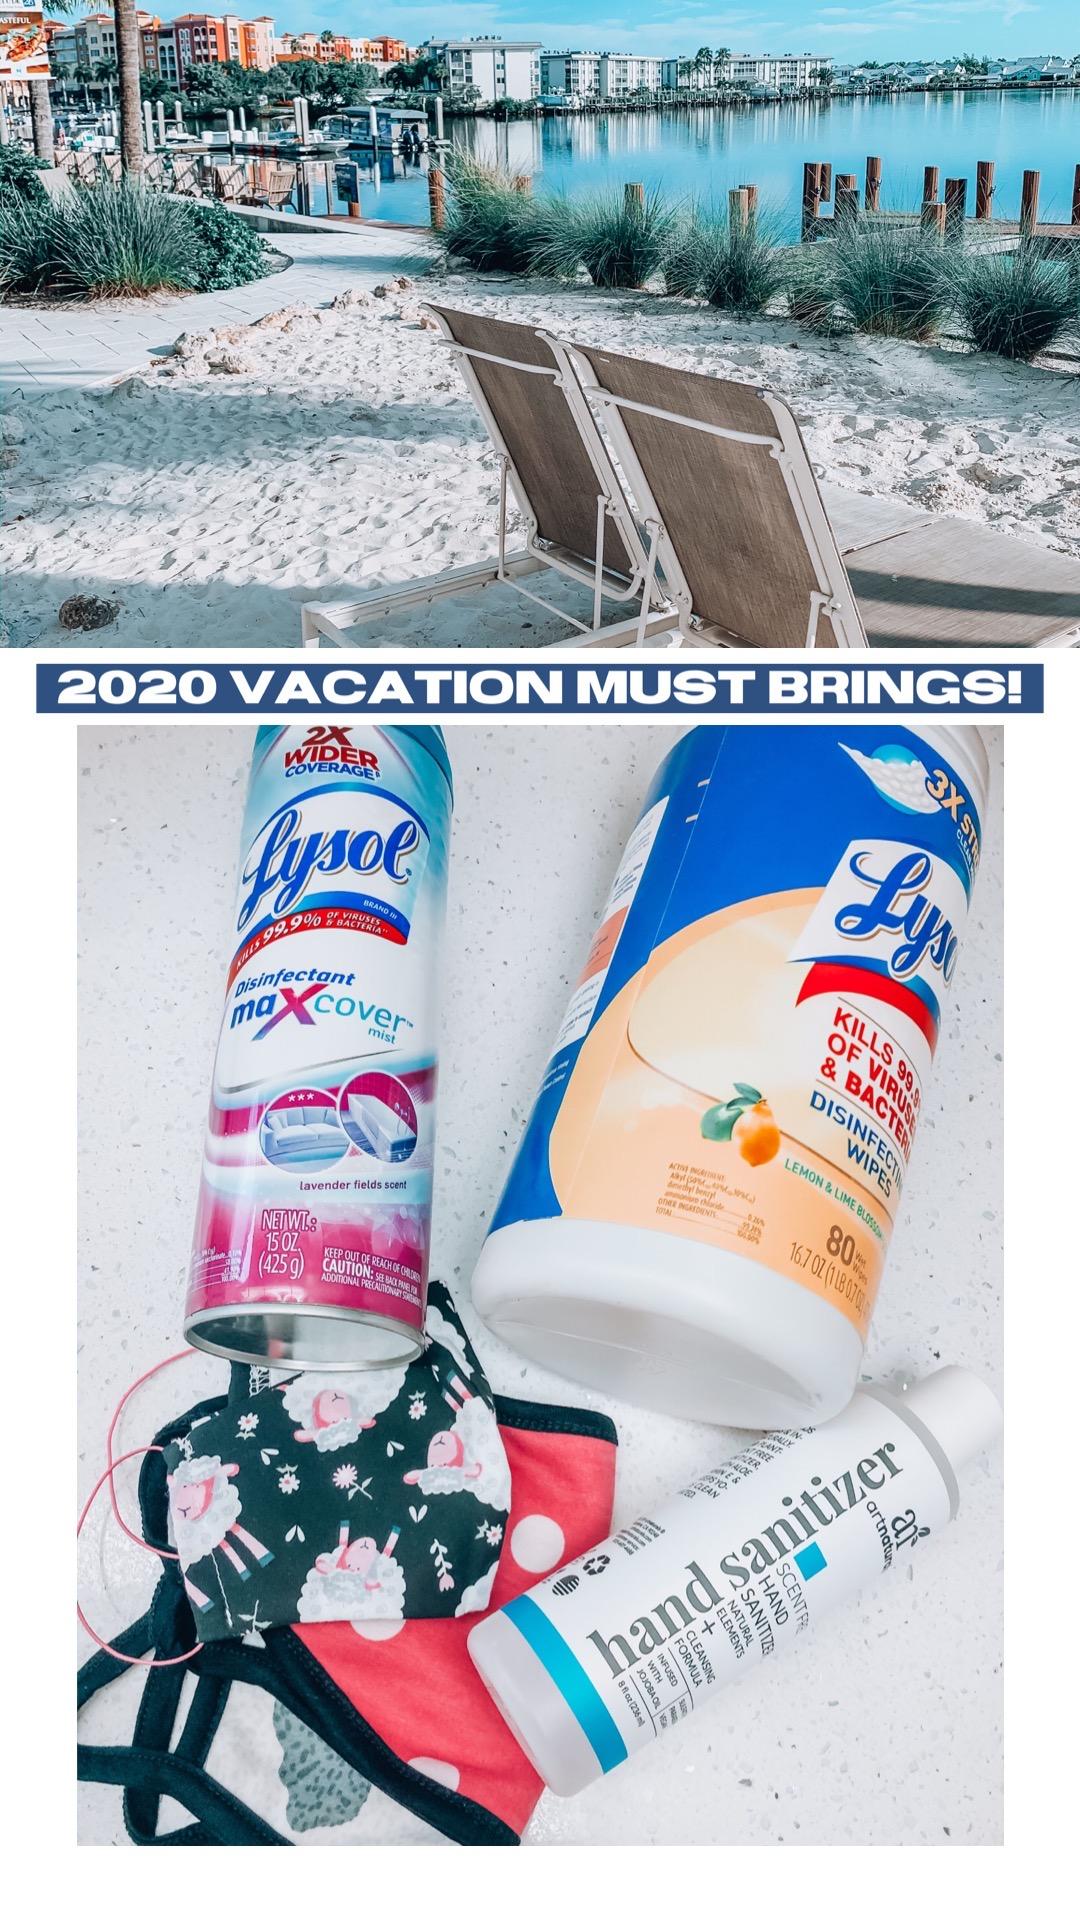 2020 Vacation MUST brings!!